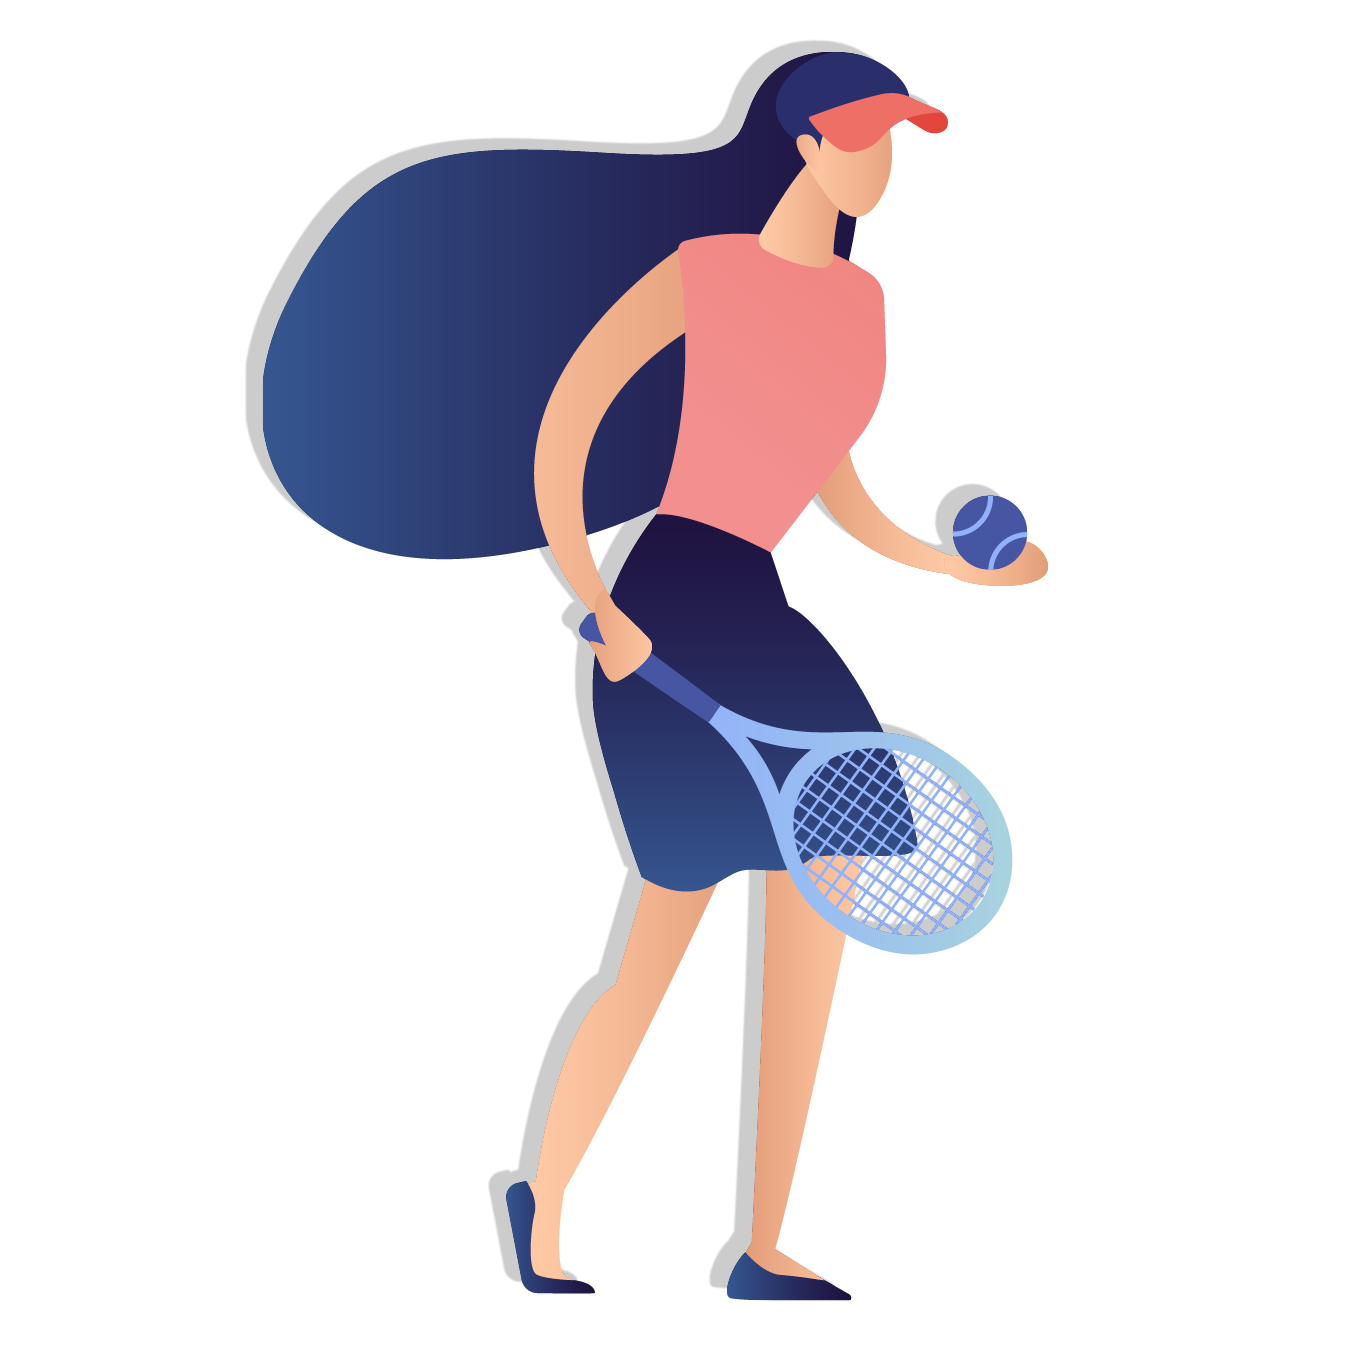 tennis-illustration-4